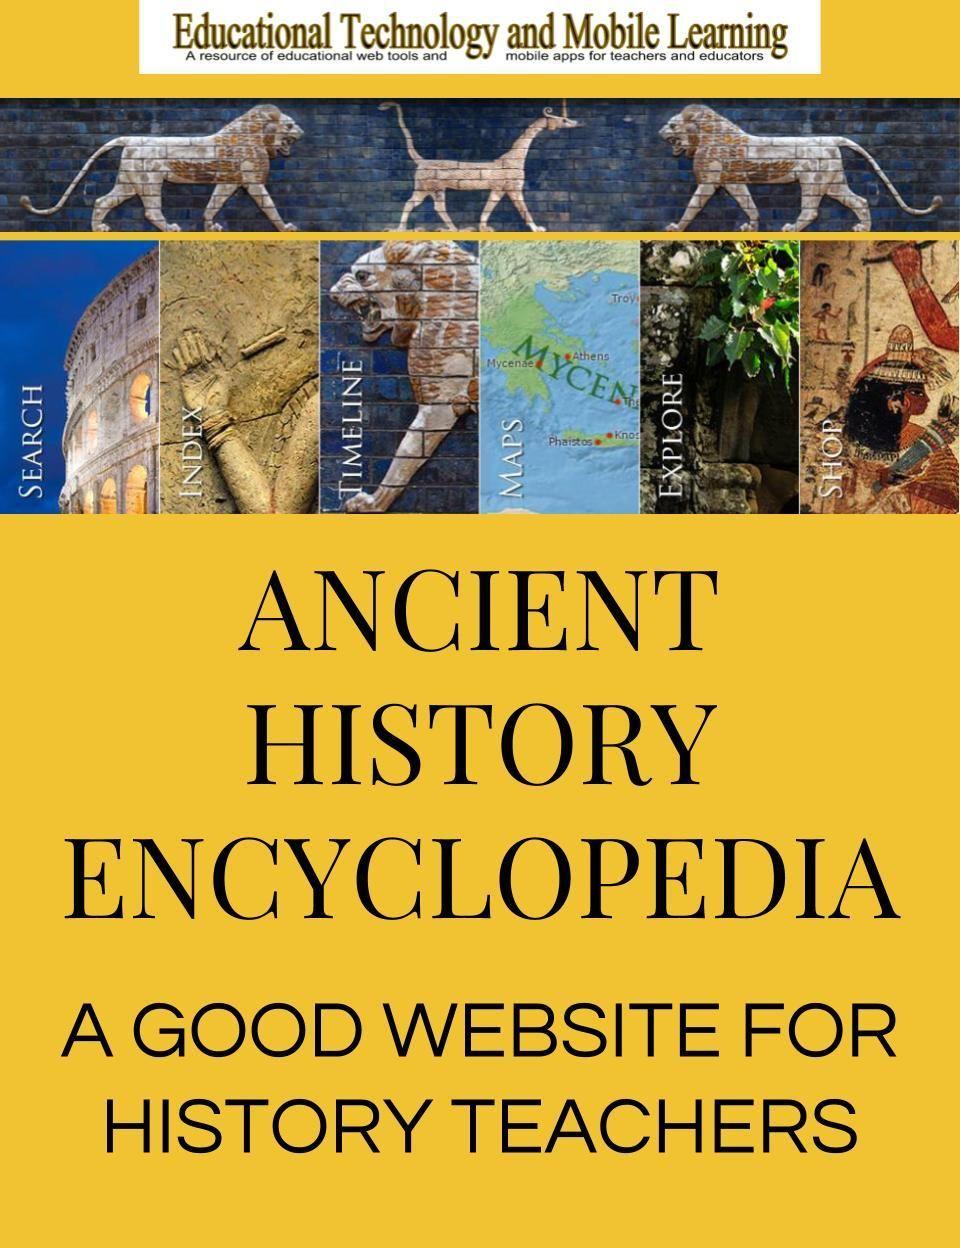 Photo of A Good Website for History Teachers